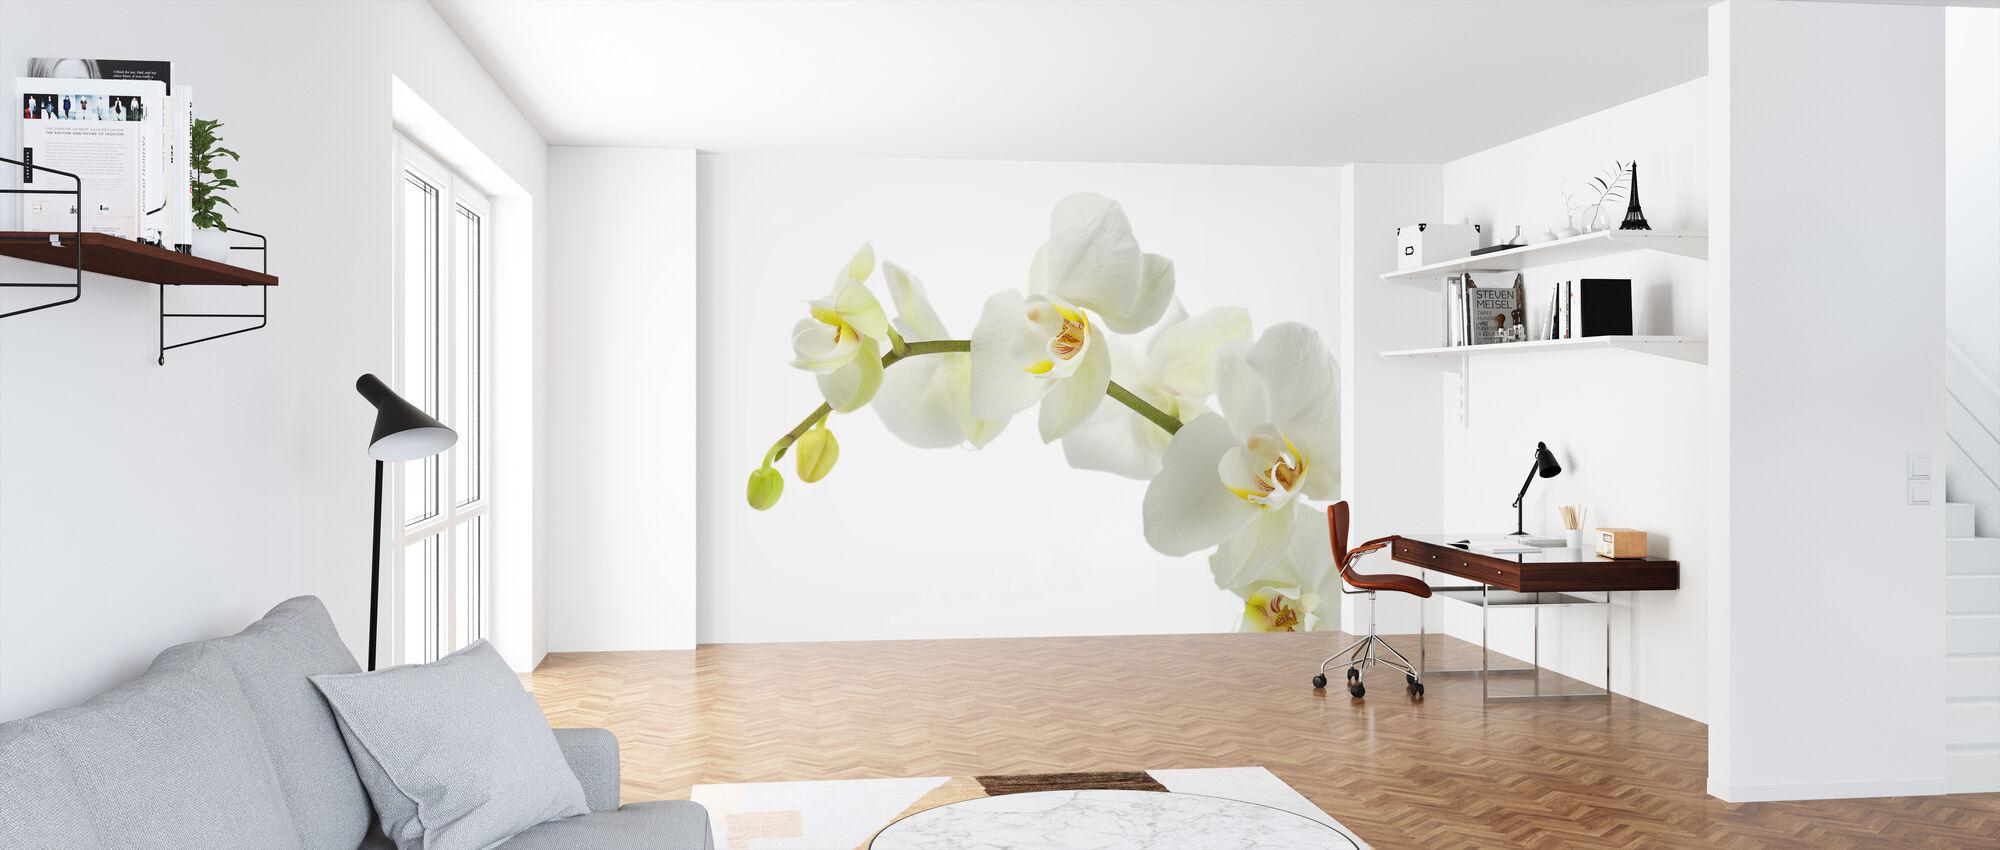 Soft White Orchid Stem - Wallpaper - Office